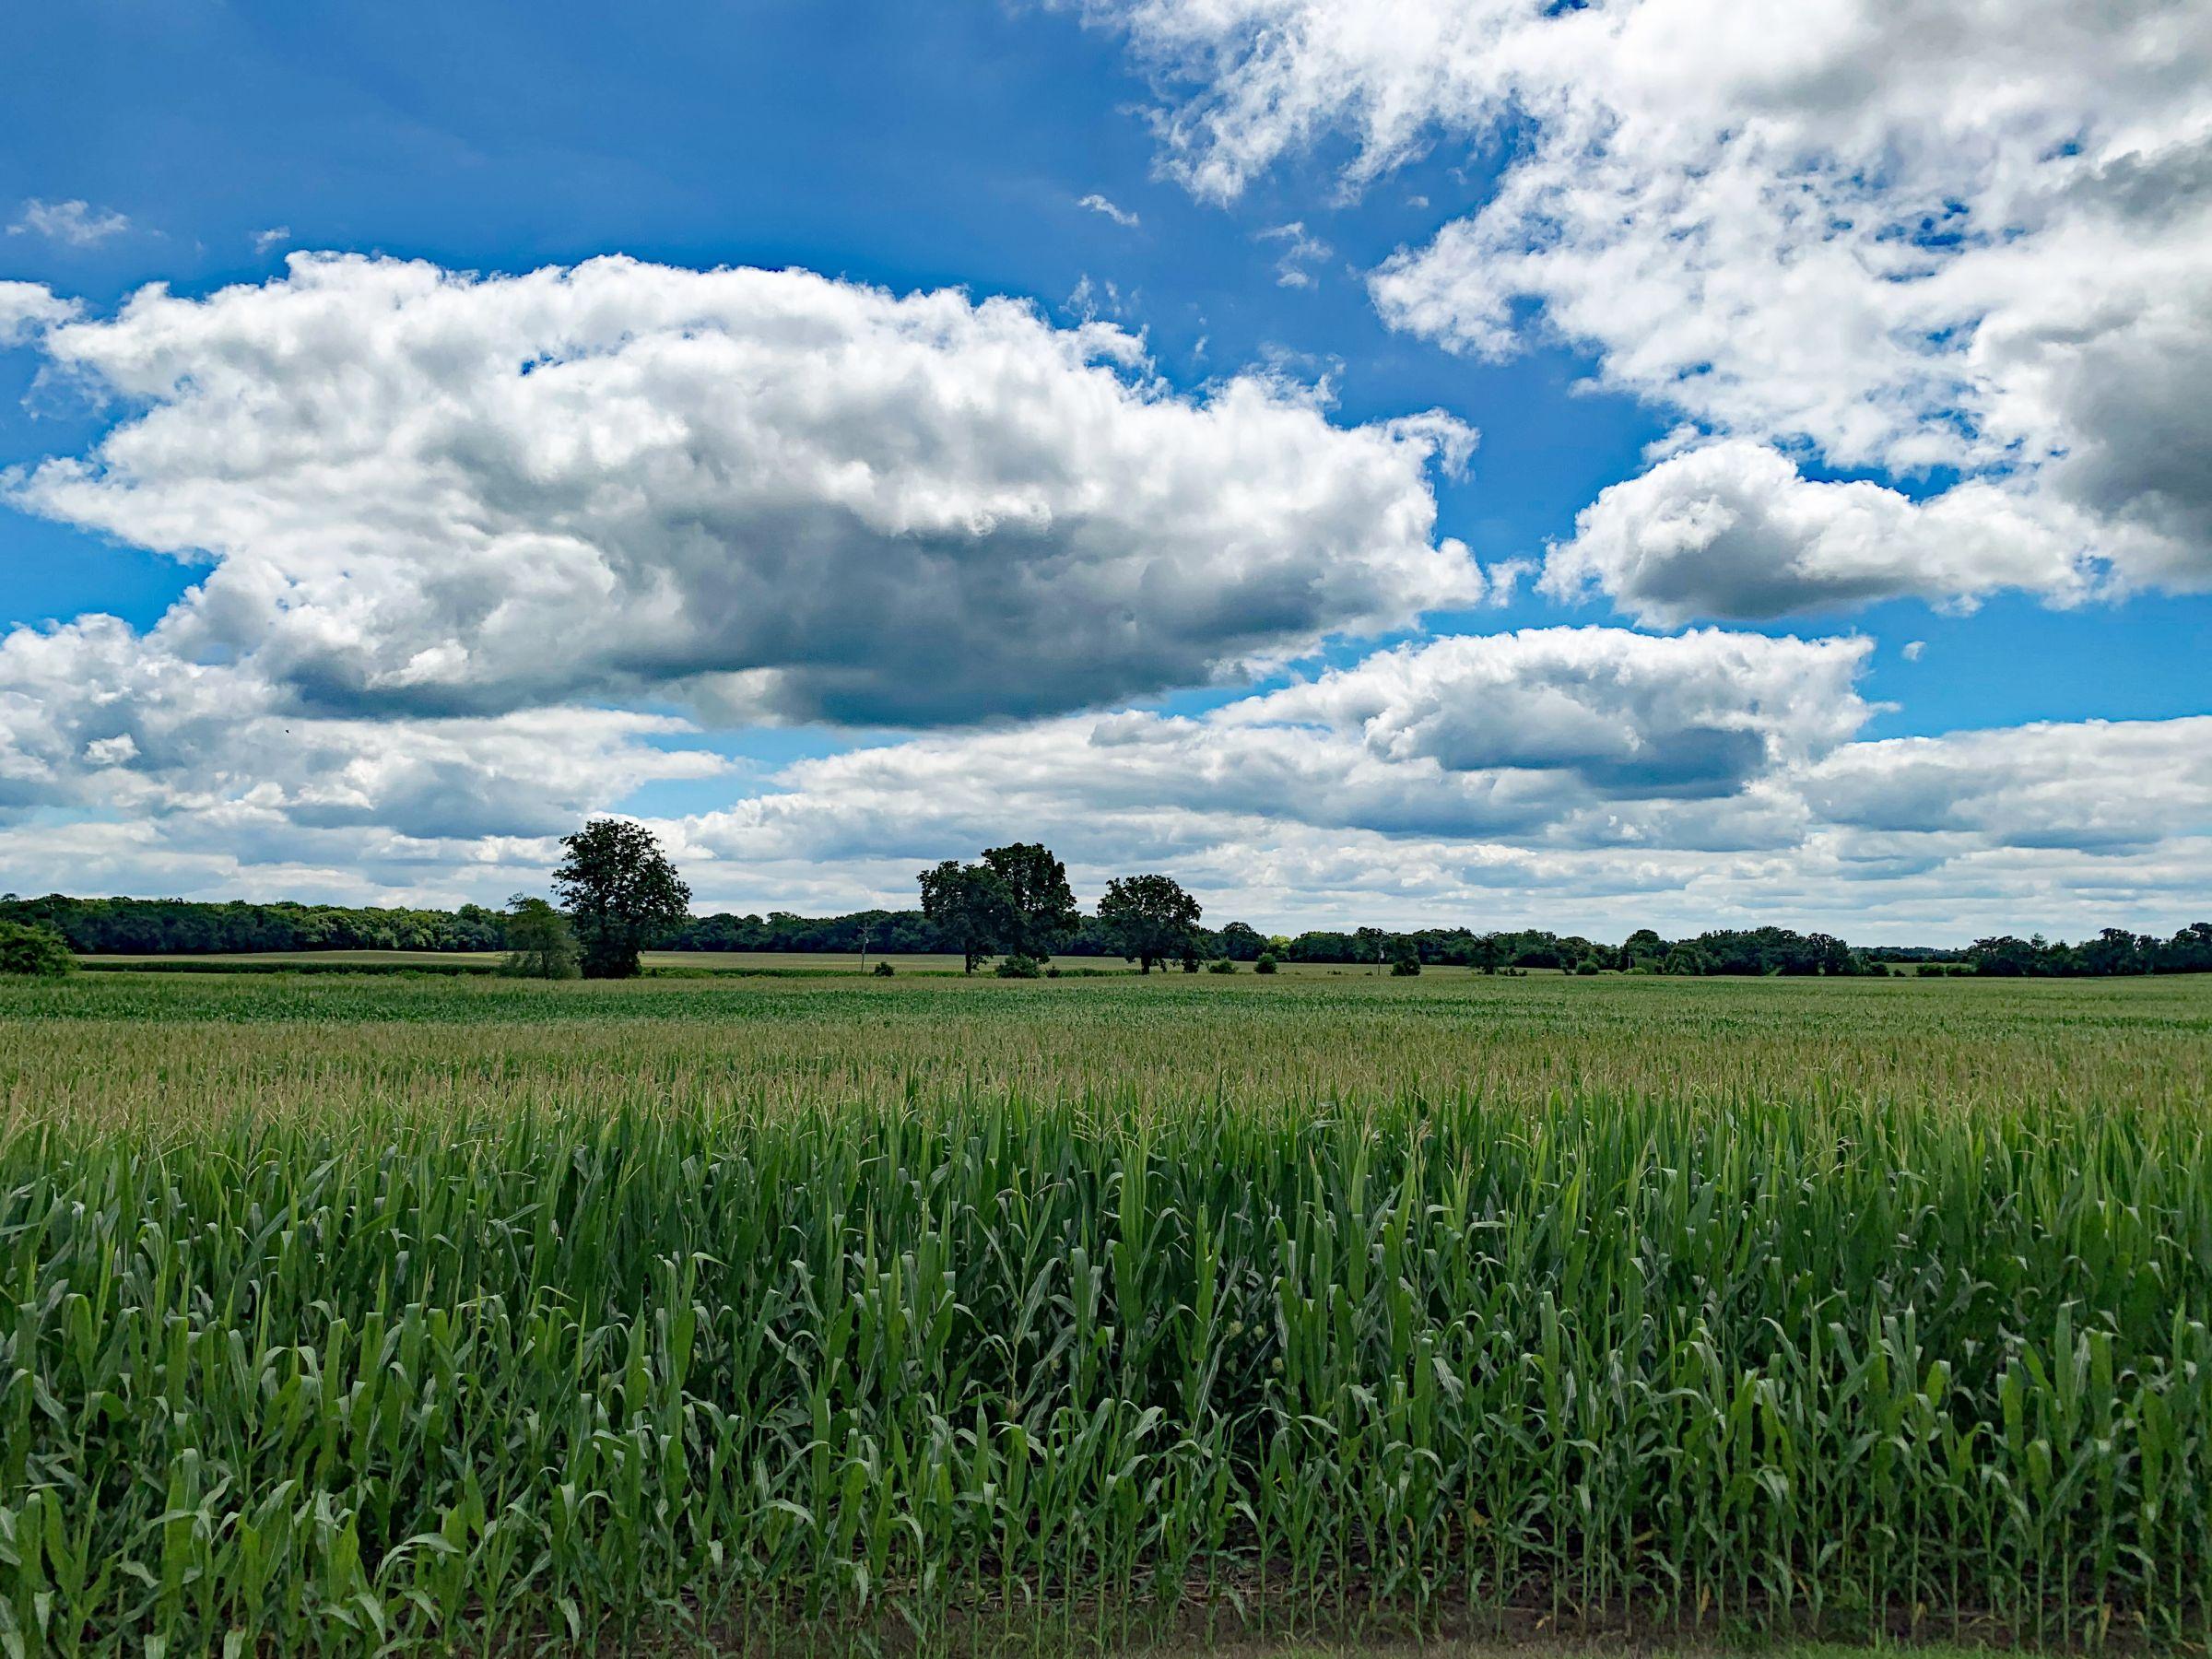 land-winnebago-county-illinois-127-acres-listing-number-15094-8-2020-08-03-160431.jpg